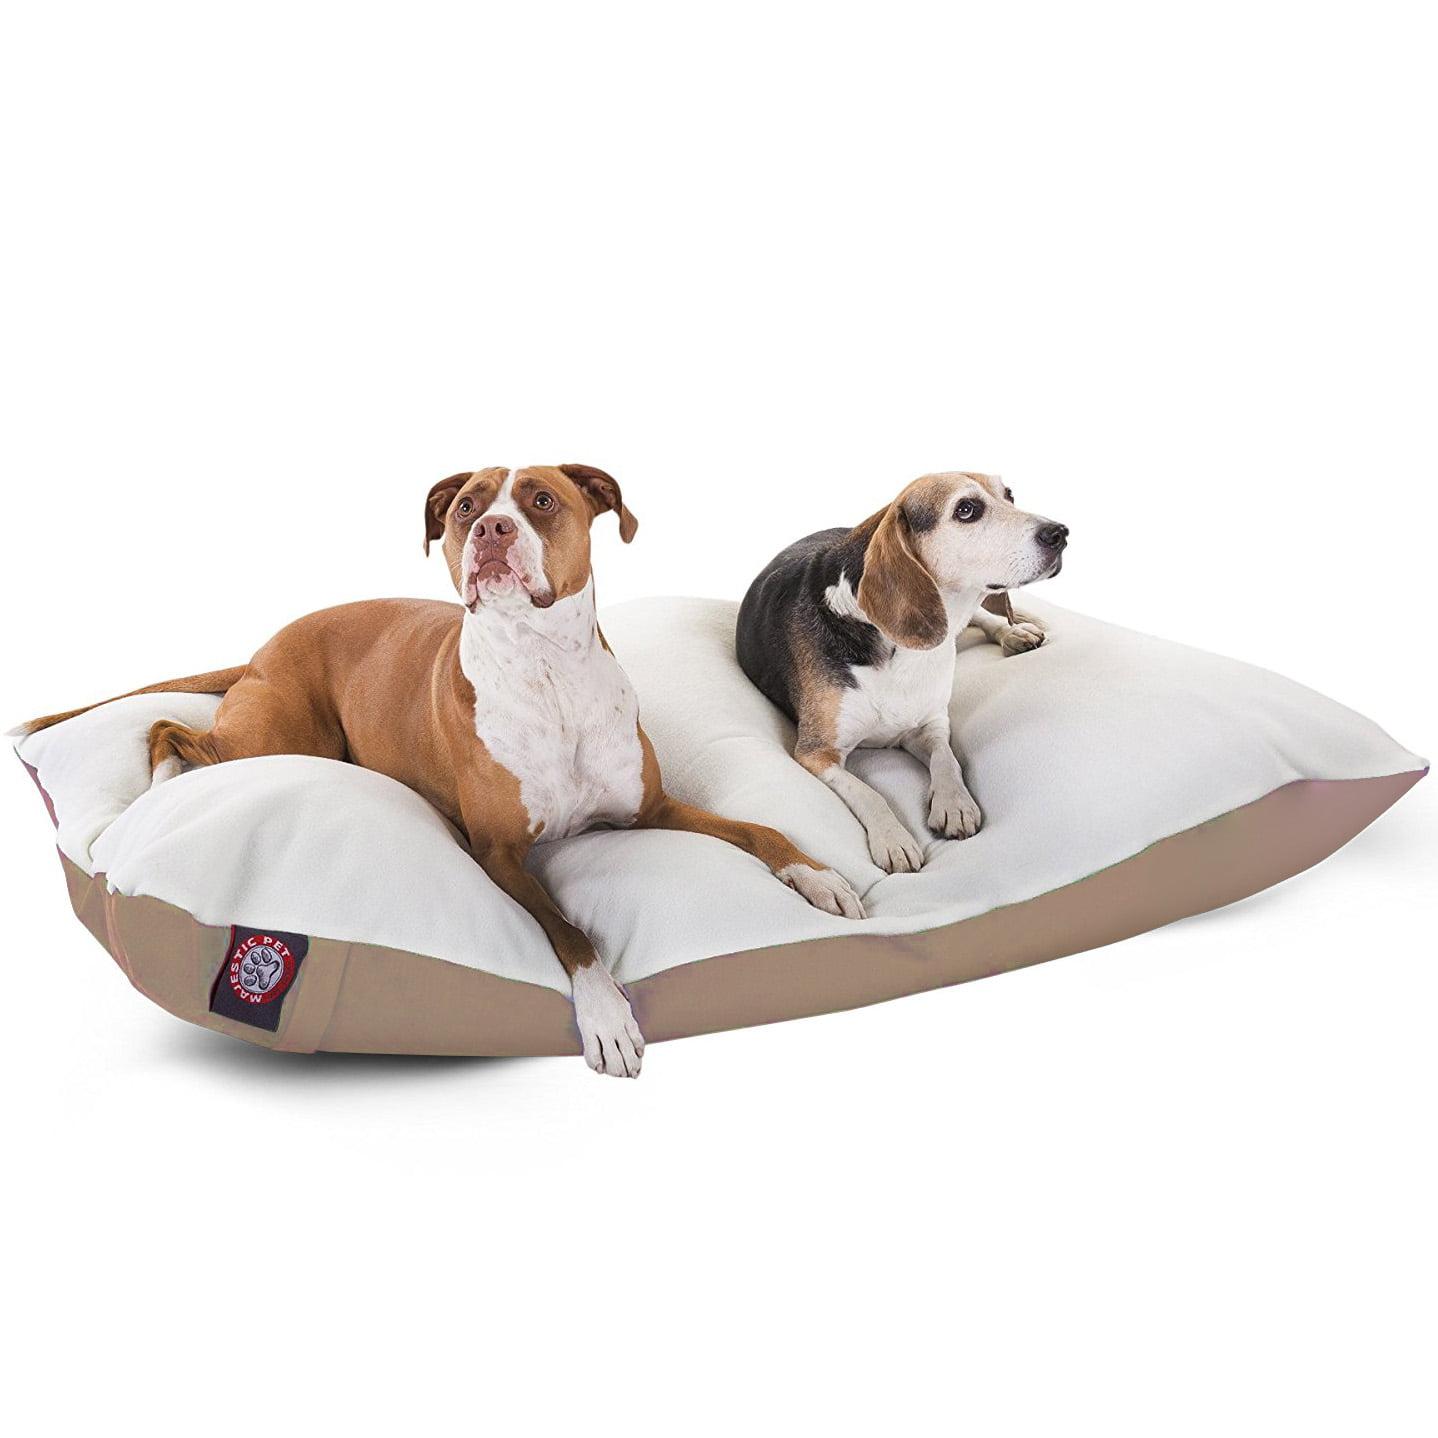 "Majestic Pet Solid Color Rectangular Pillow Dog Bed Machine Washable Khaki X-Large 42"" x 60"" x 8"""